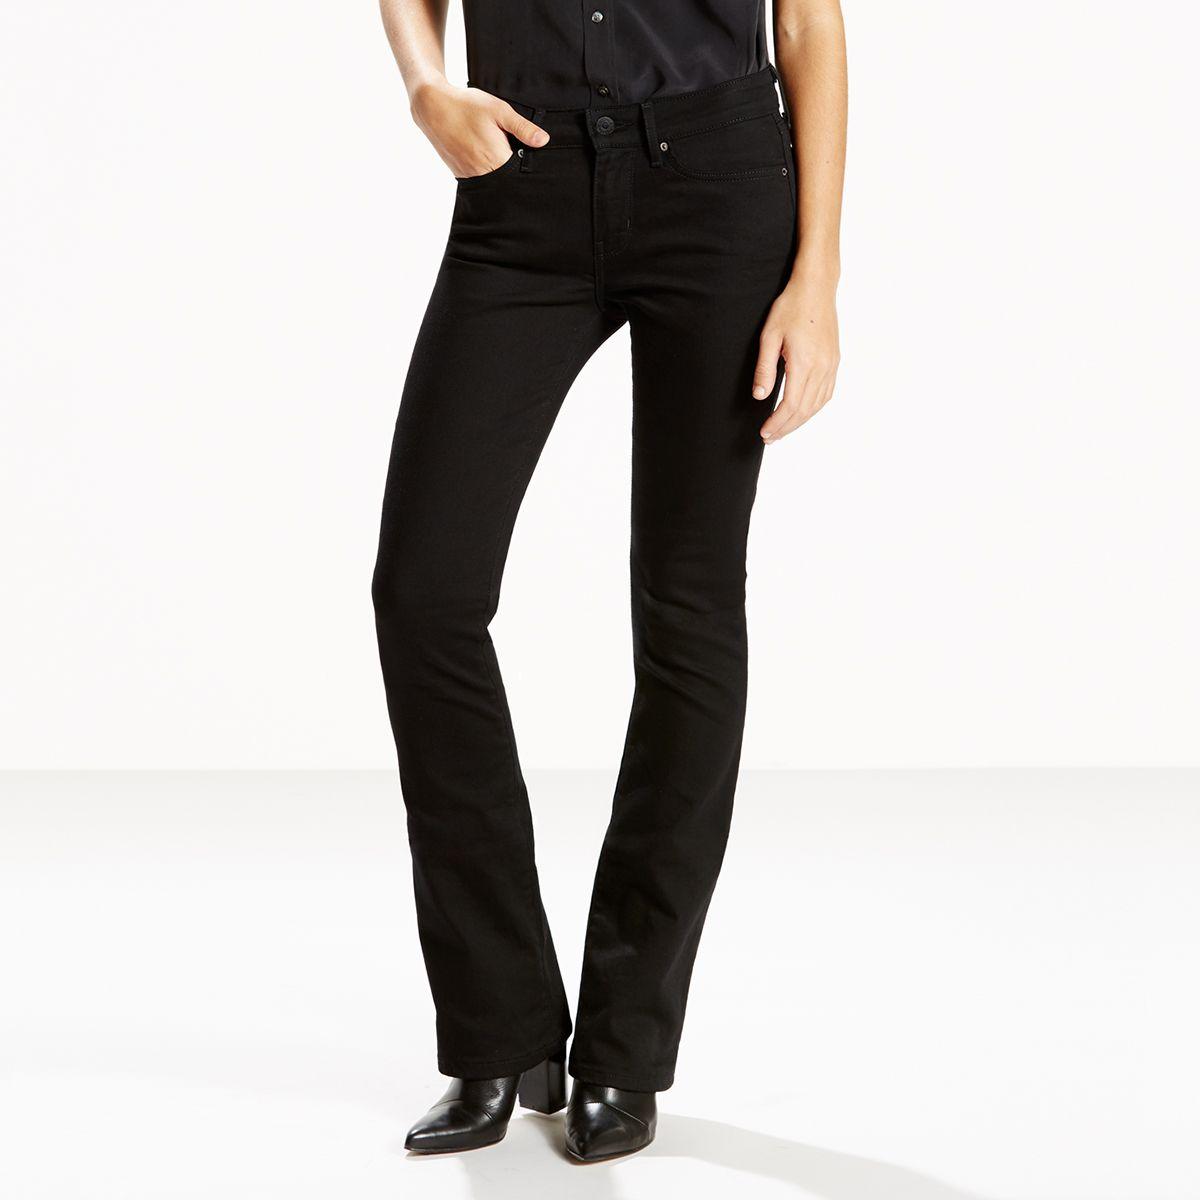 aac3b9fa385 Bootcut Womens Levis Jeans & Denim Apparel - Macy's